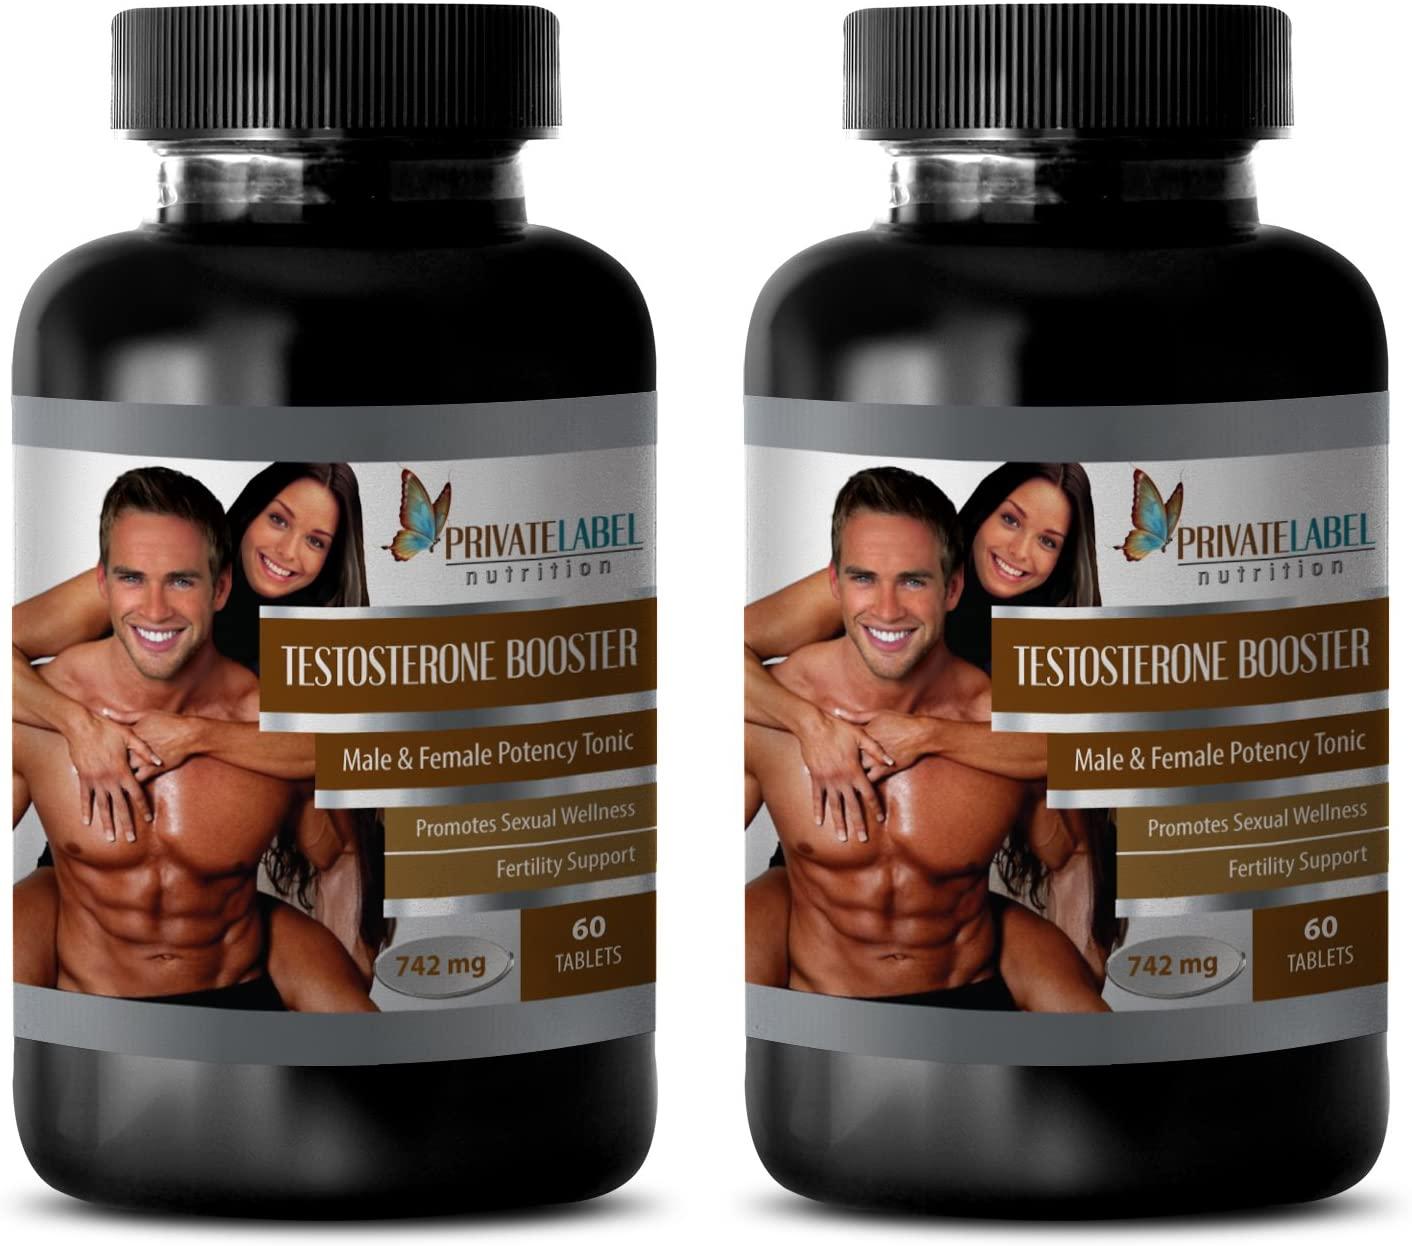 Muscle Mass Pills - Testosterone Booster 742 - Testosterone Booster for Men Fat Burner - 2 Bottles 120 Tablets